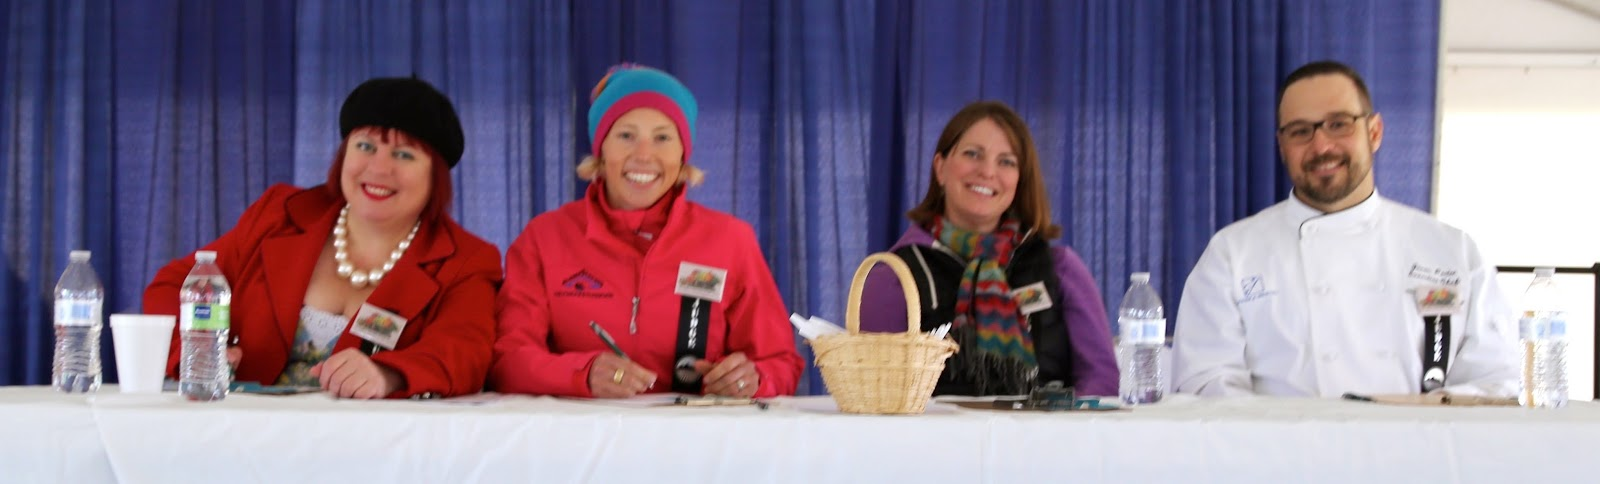 Judging the Alaskan seafood competition, Alaska state fair